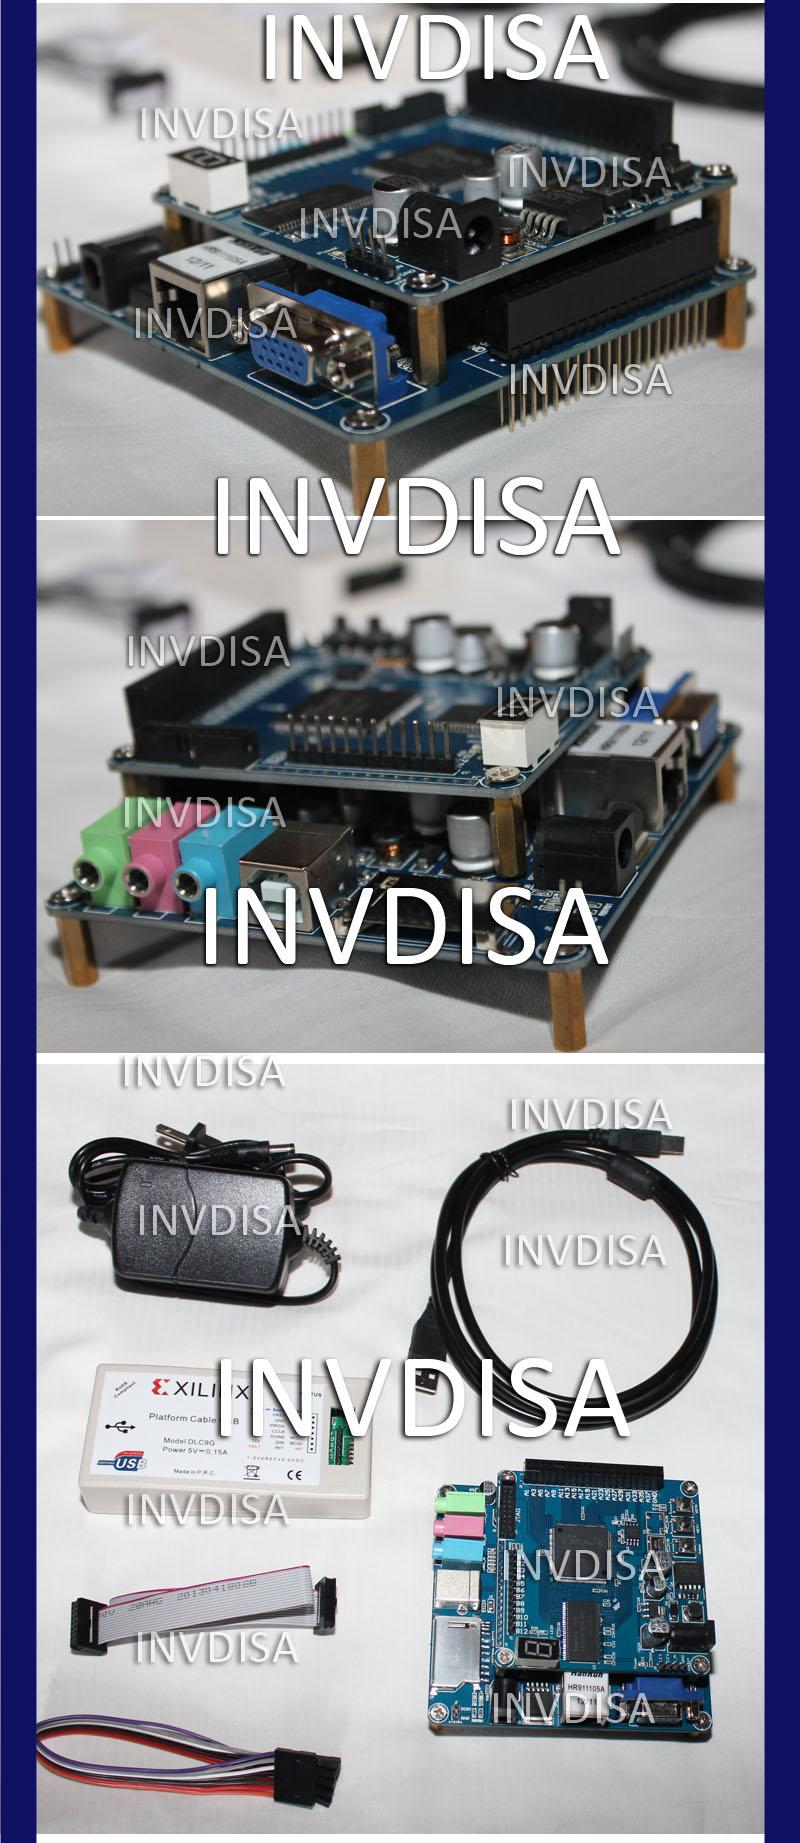 http://www.invdisa.com/ML/BcaractSpantan6